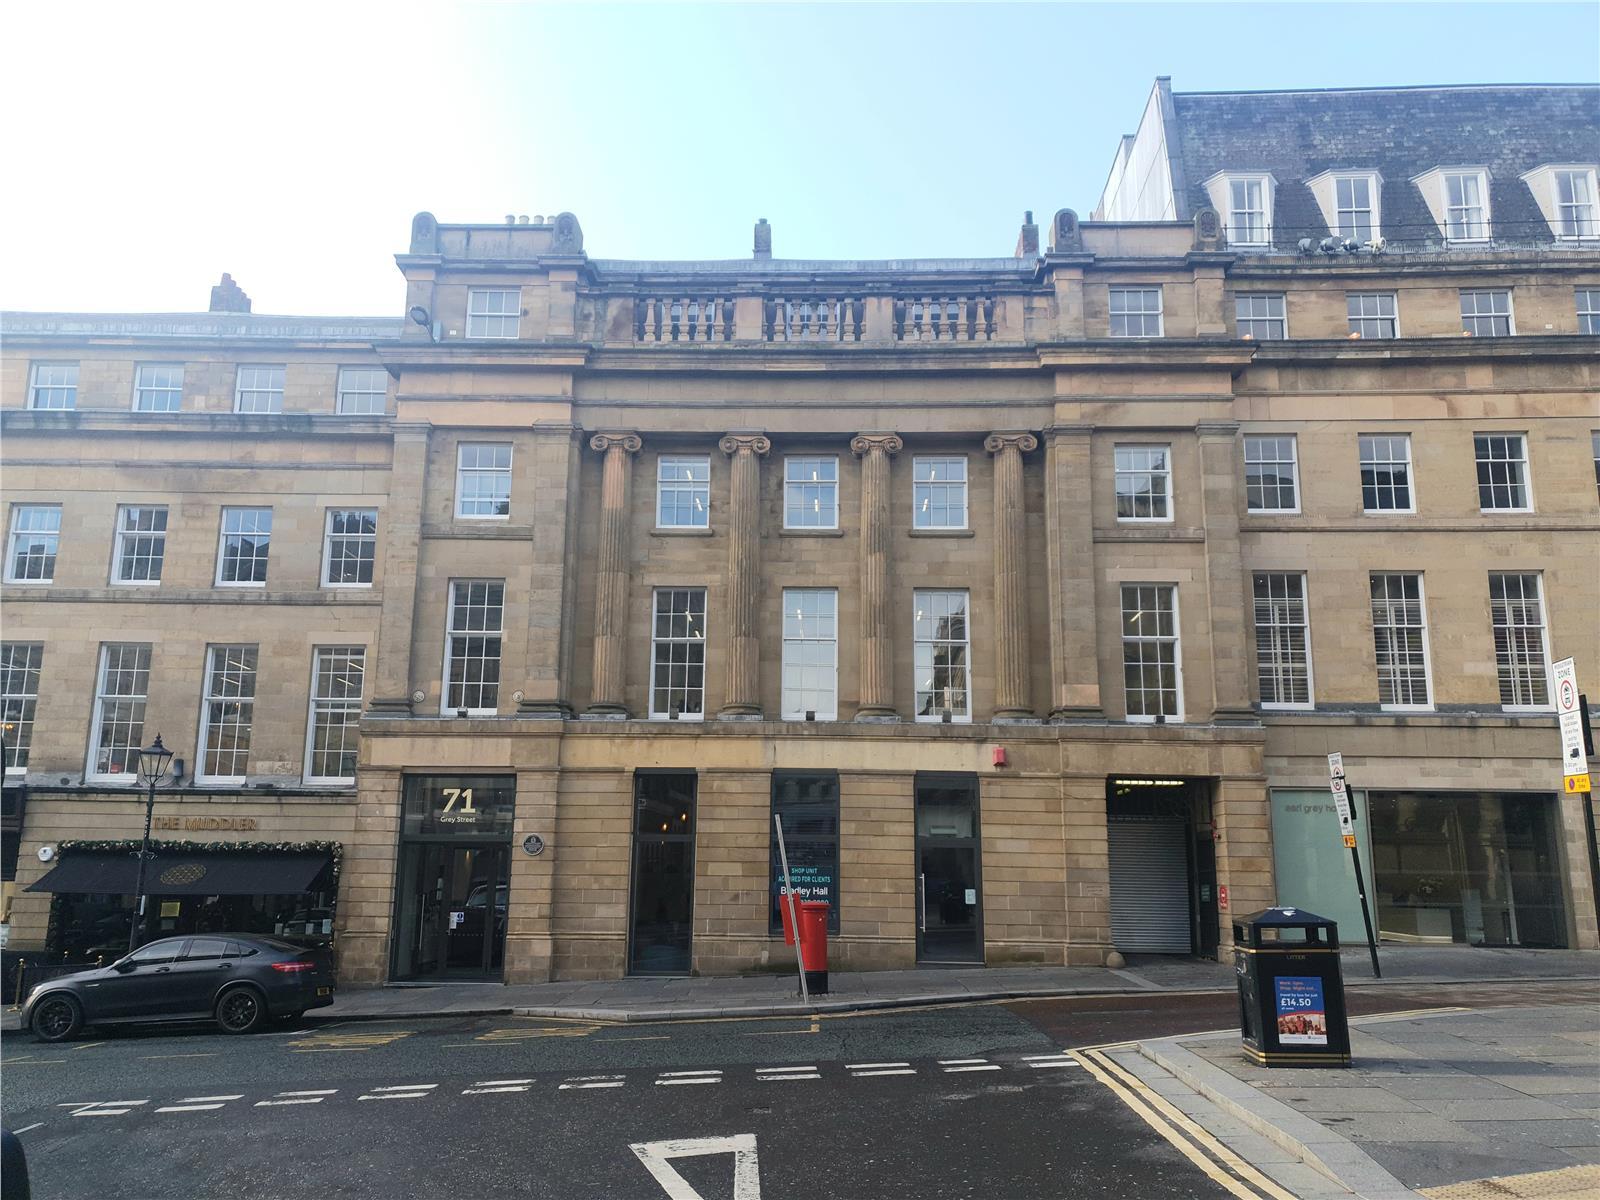 Unit 2, 3rd Floor, 71 Grey Street, Newcastle Upon Tyne, Tyne And Wear, NE1